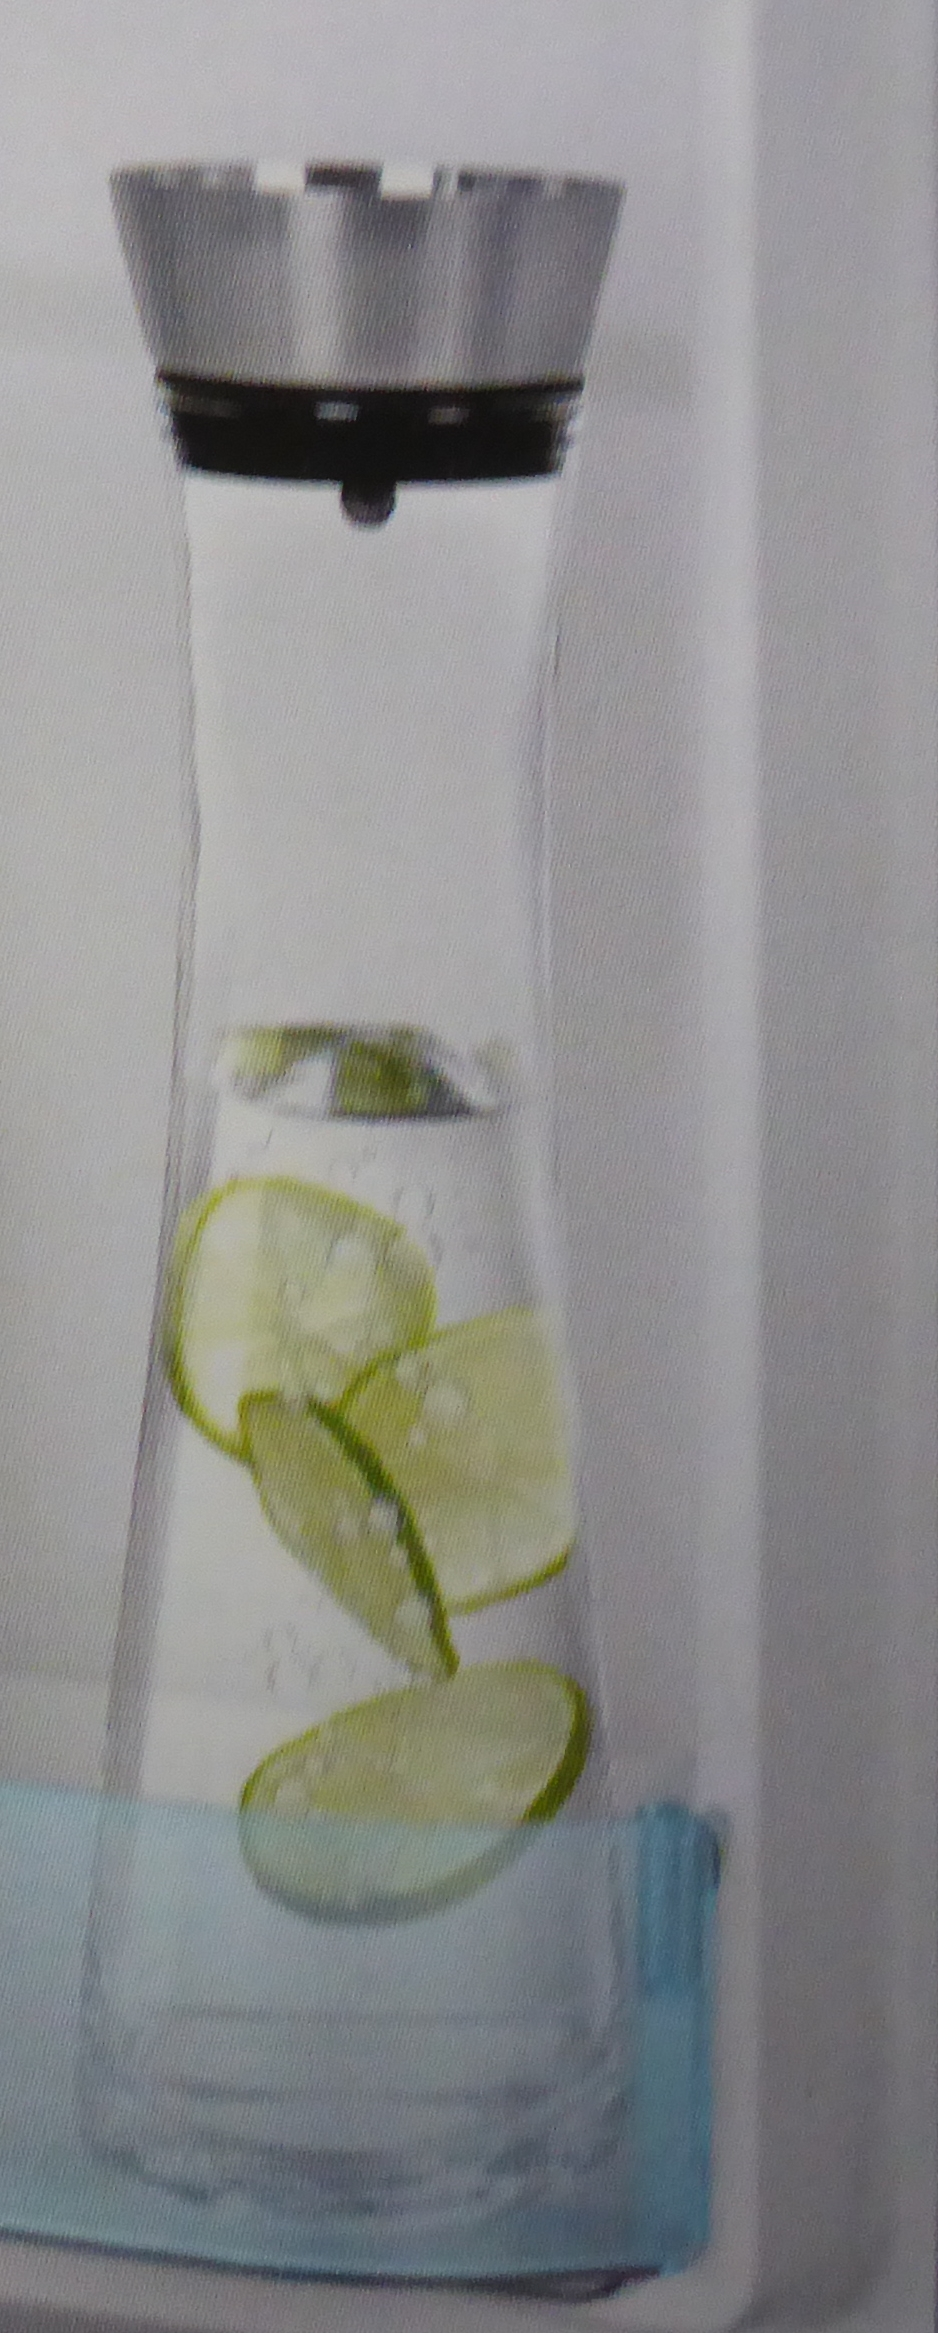 glaskaraffe 1 liter mit praktischem edelstahlausgie er bremermann ebay. Black Bedroom Furniture Sets. Home Design Ideas